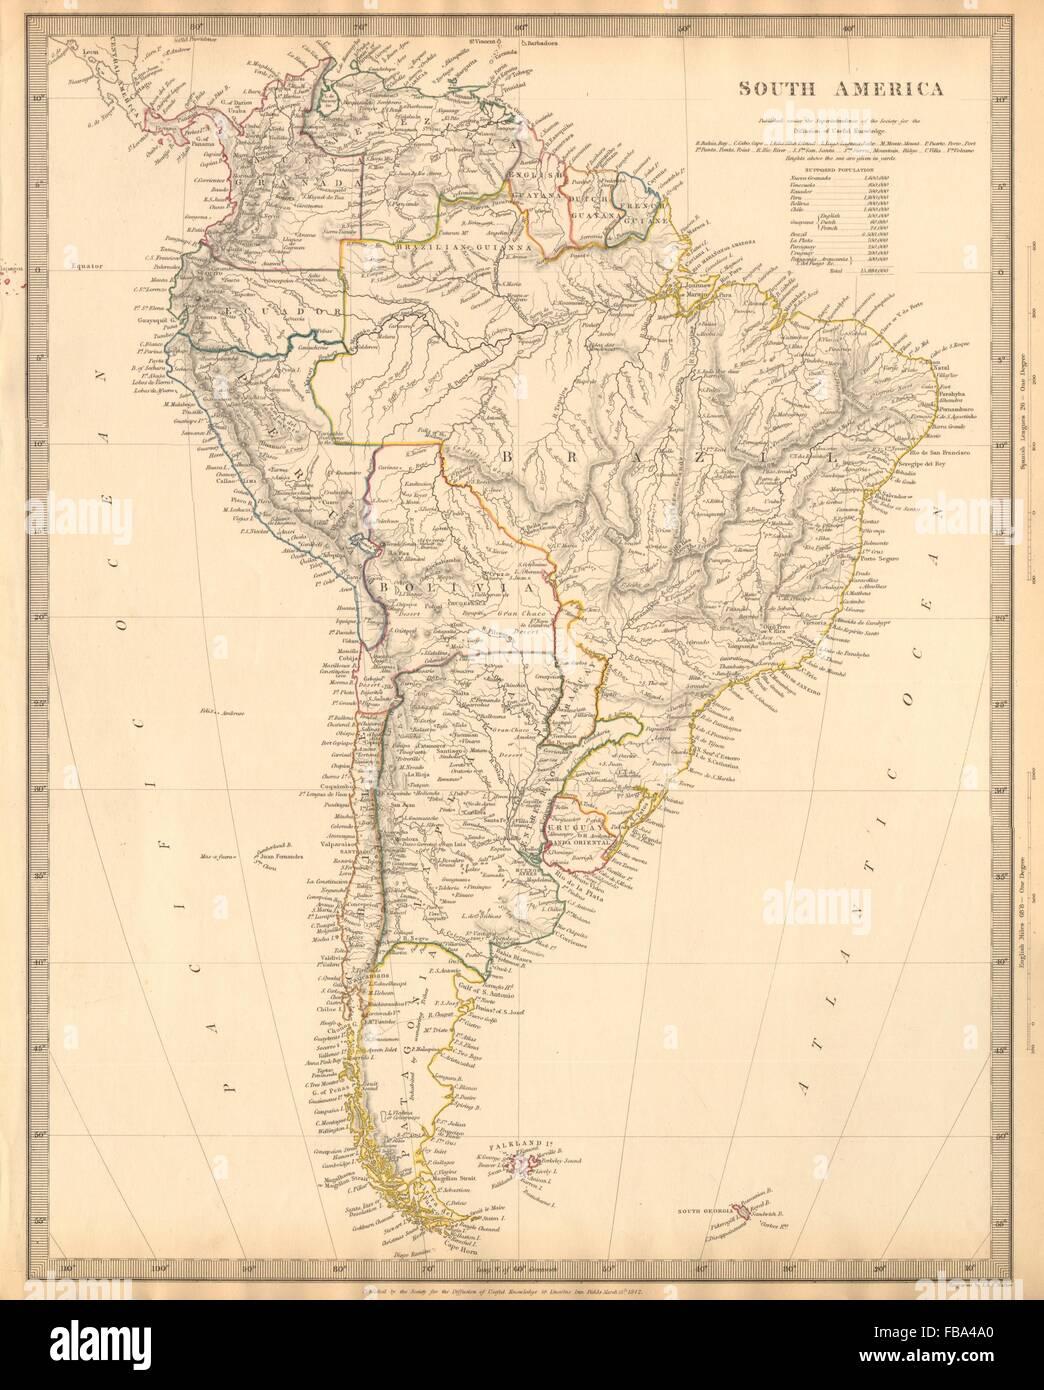 Map peru chile stock photos map peru chile stock images alamy south america brazil chile peru bolivia patagonia la plata sduk 1844 map gumiabroncs Gallery